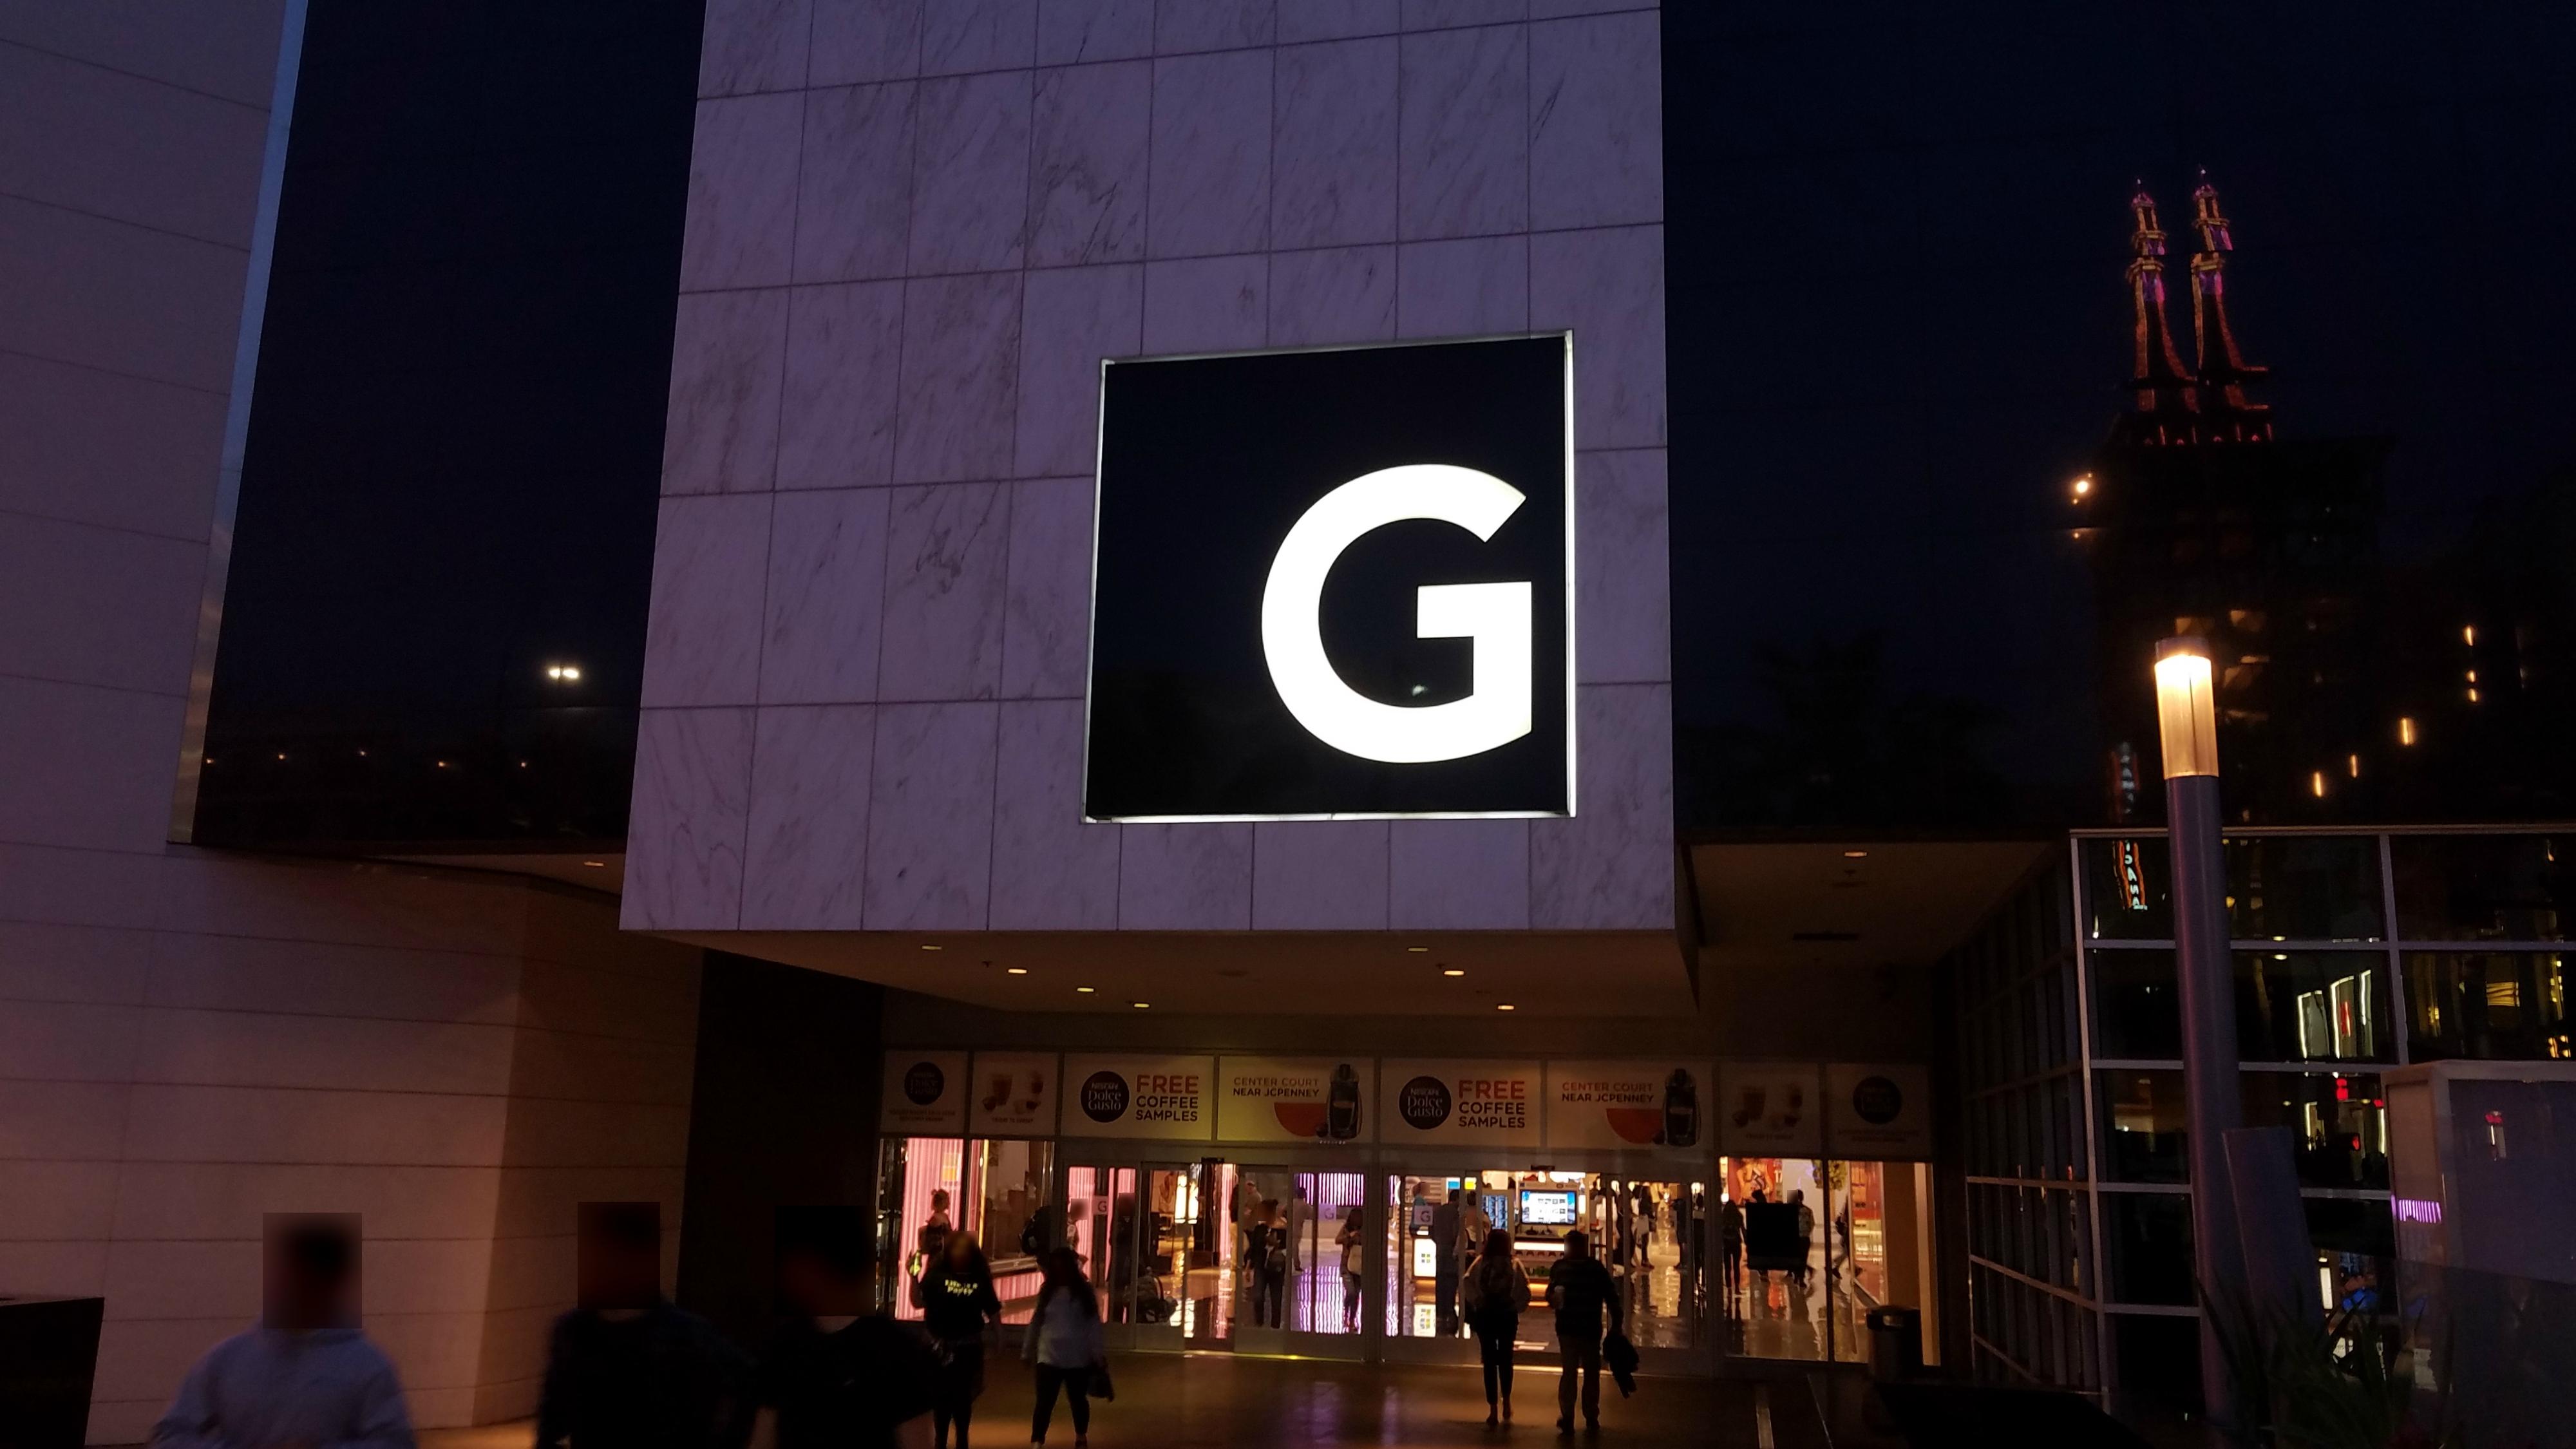 b1031366e Glendale Galleria - Wikipedia